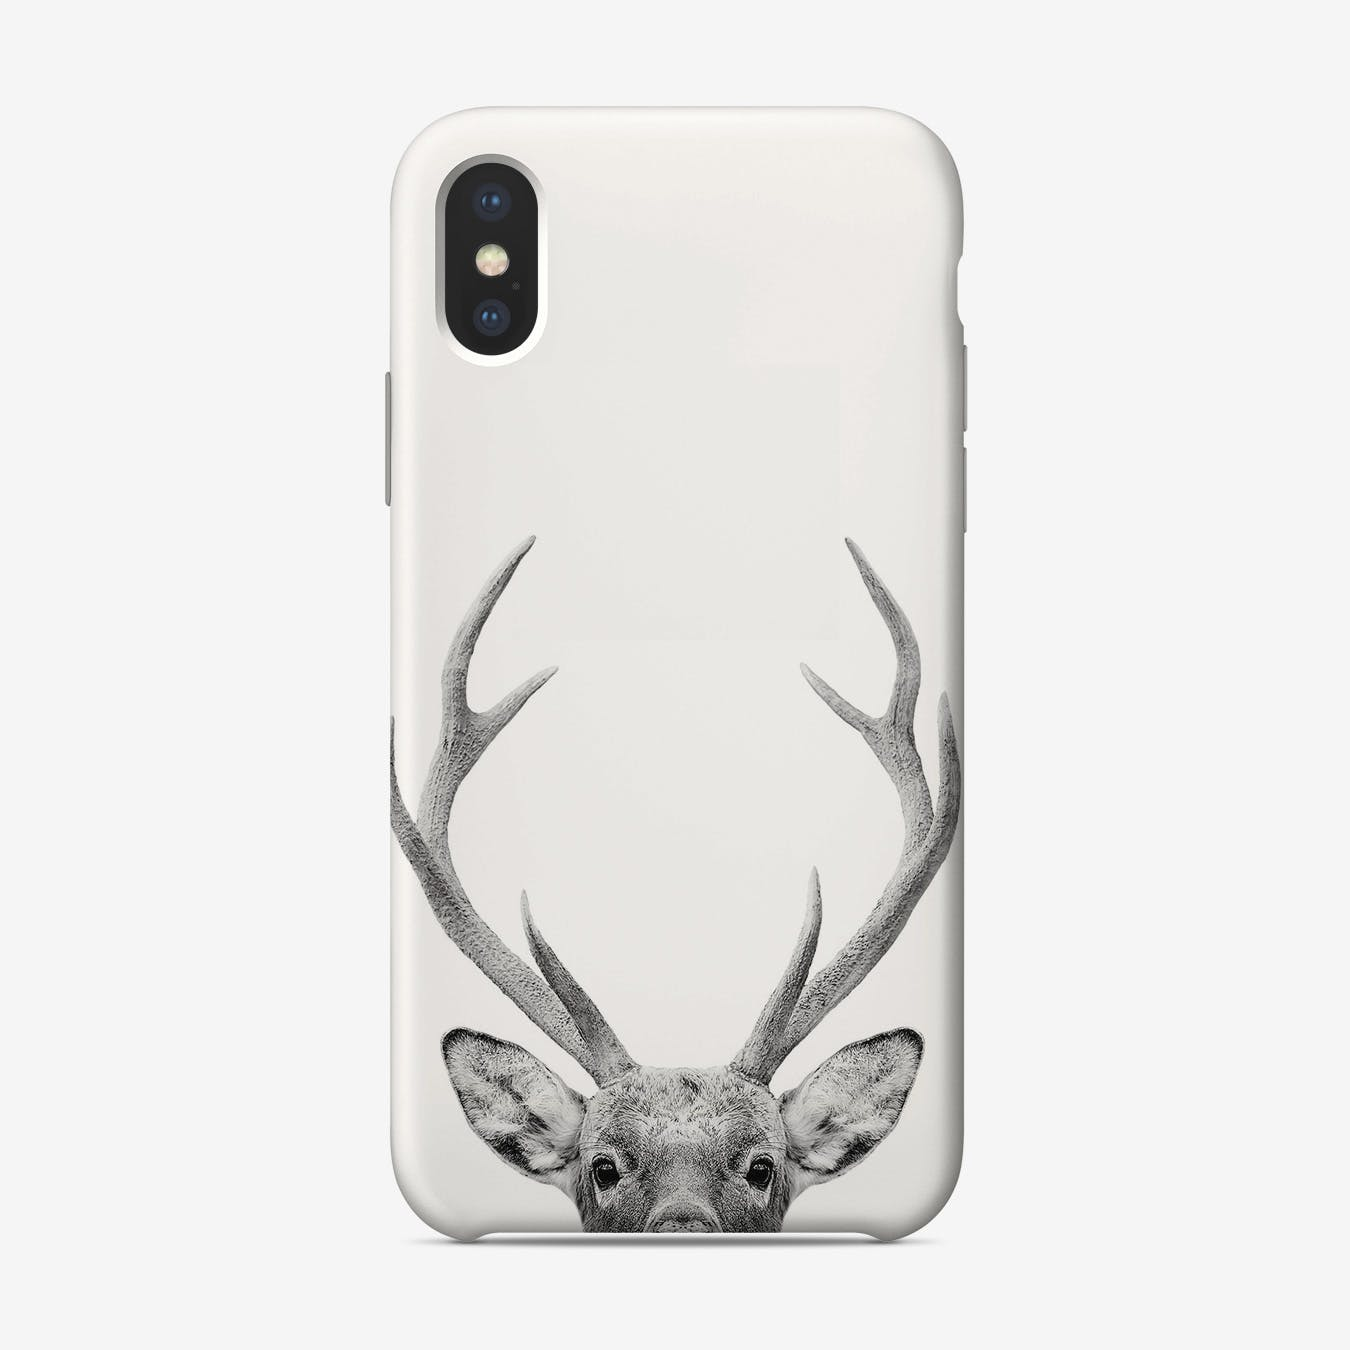 Deer B&W iPhone Case